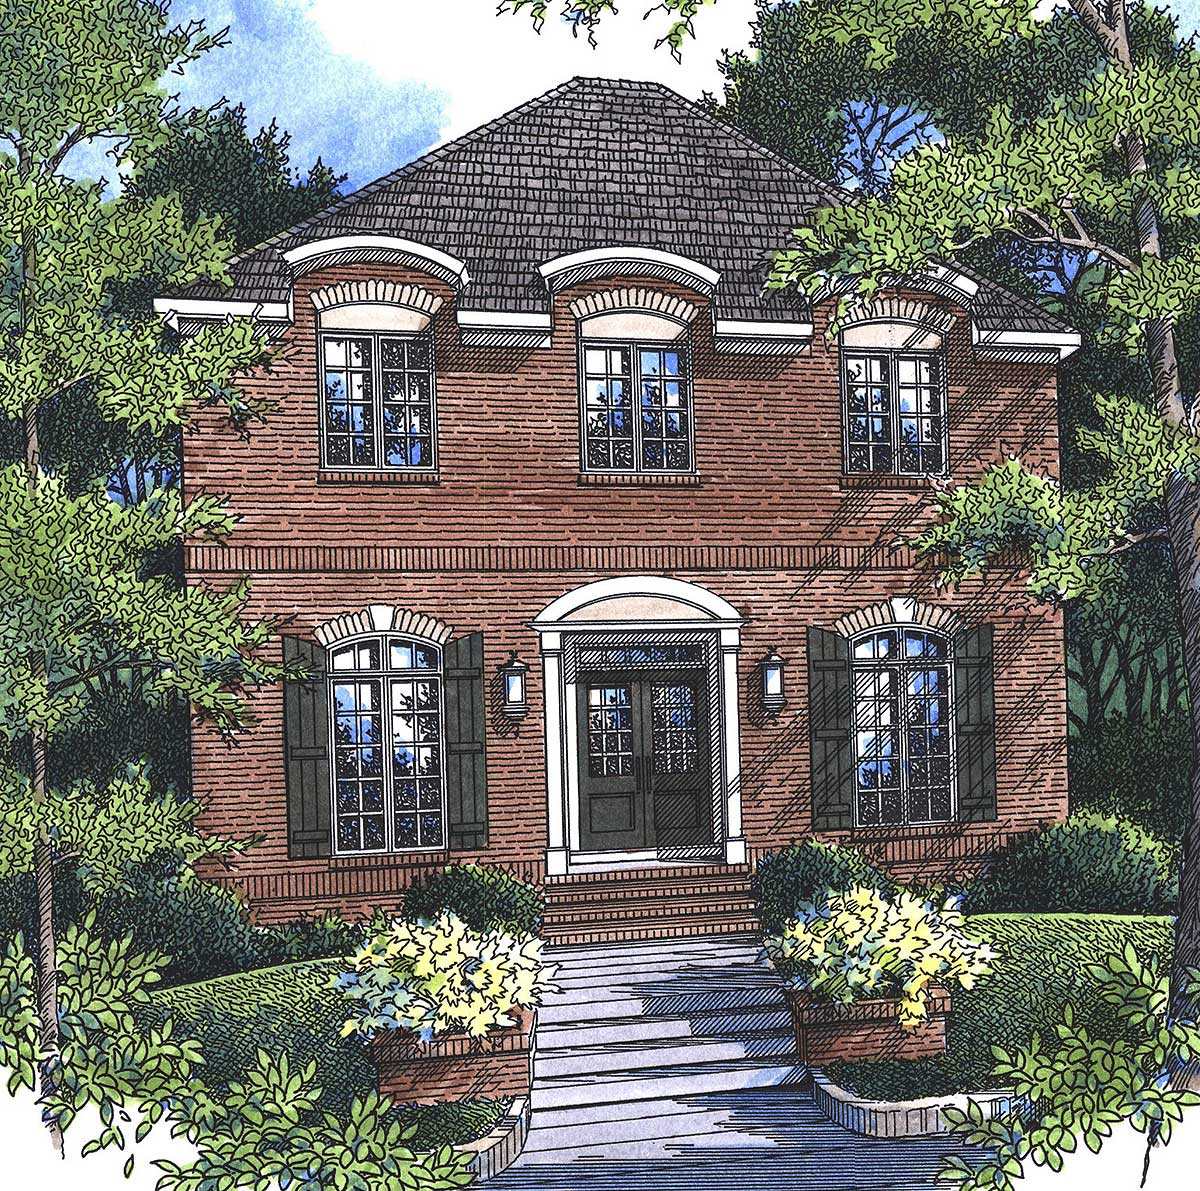 Home Exterior Options: Brick Exterior With Options - 92102VS